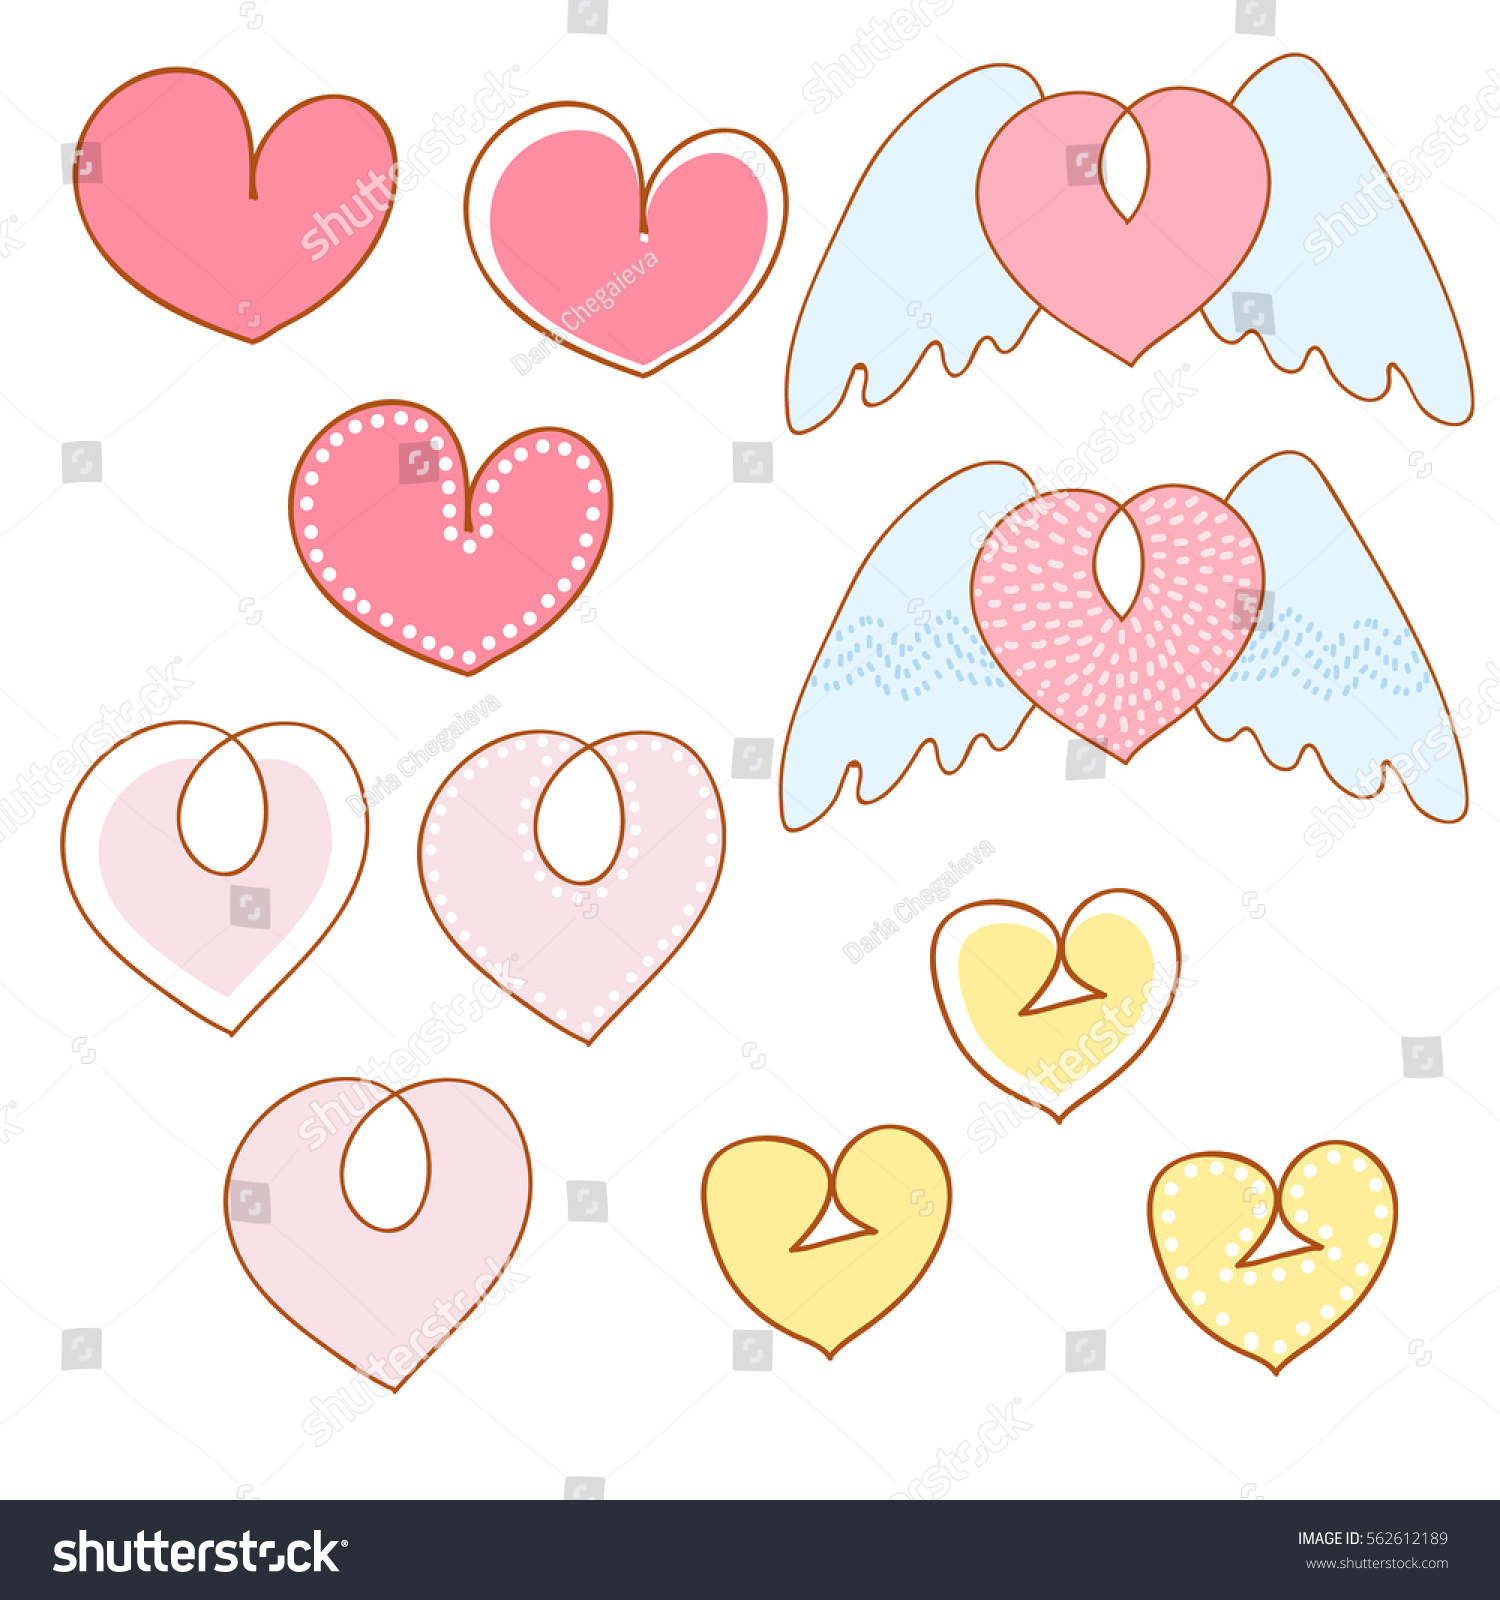 Cute cartoon hand drawn heart vector stock vector 562612189 cute cartoon hand drawn heart vector illustration set of heart shape love icon buycottarizona Images